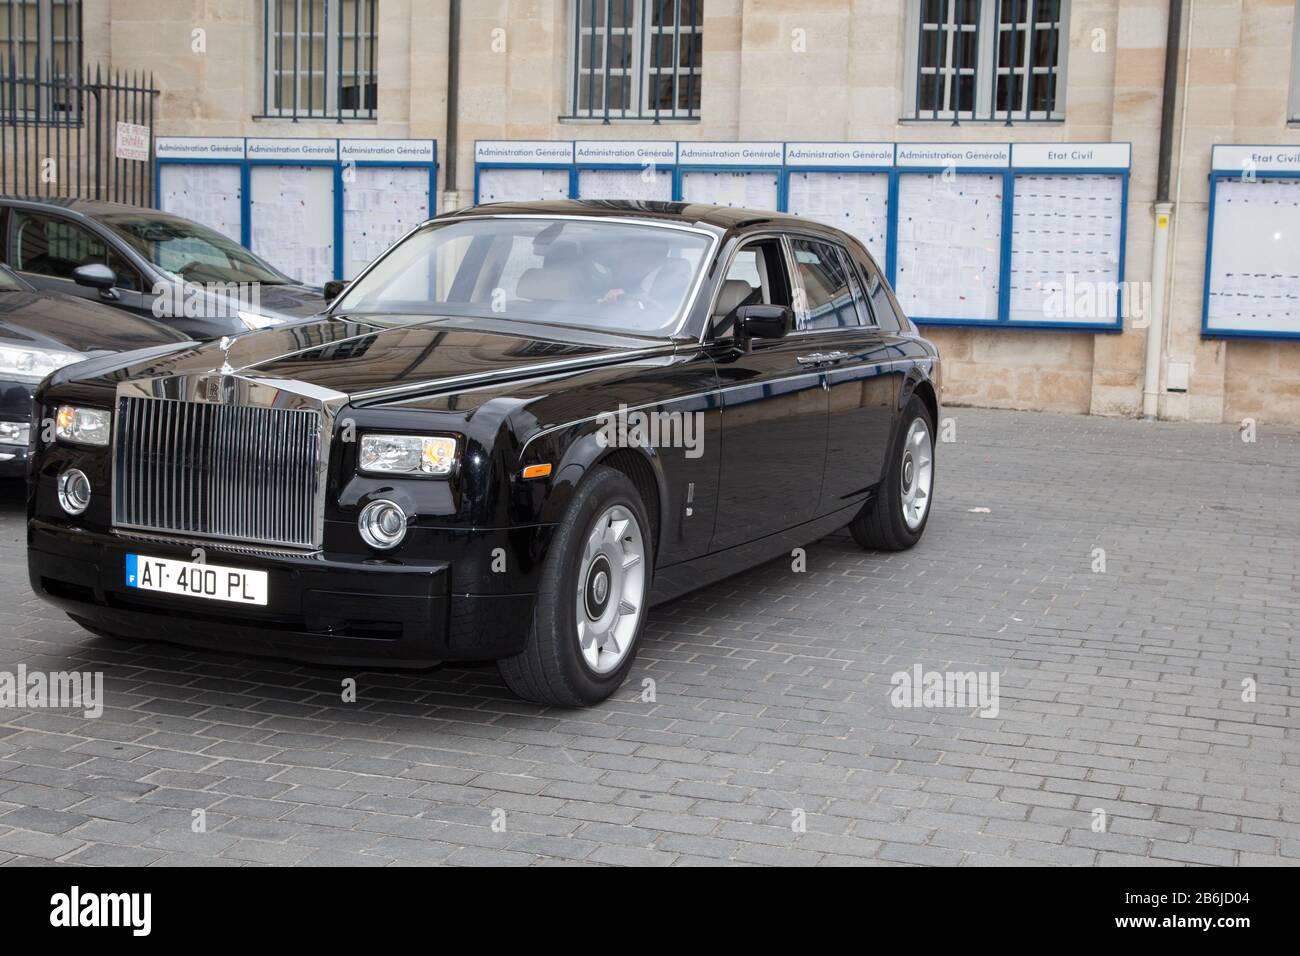 Bordeaux Aquitaine France 11 07 2019 Rolls Royce Phantom Black Luxury Car Parked In Street Stock Photo Alamy